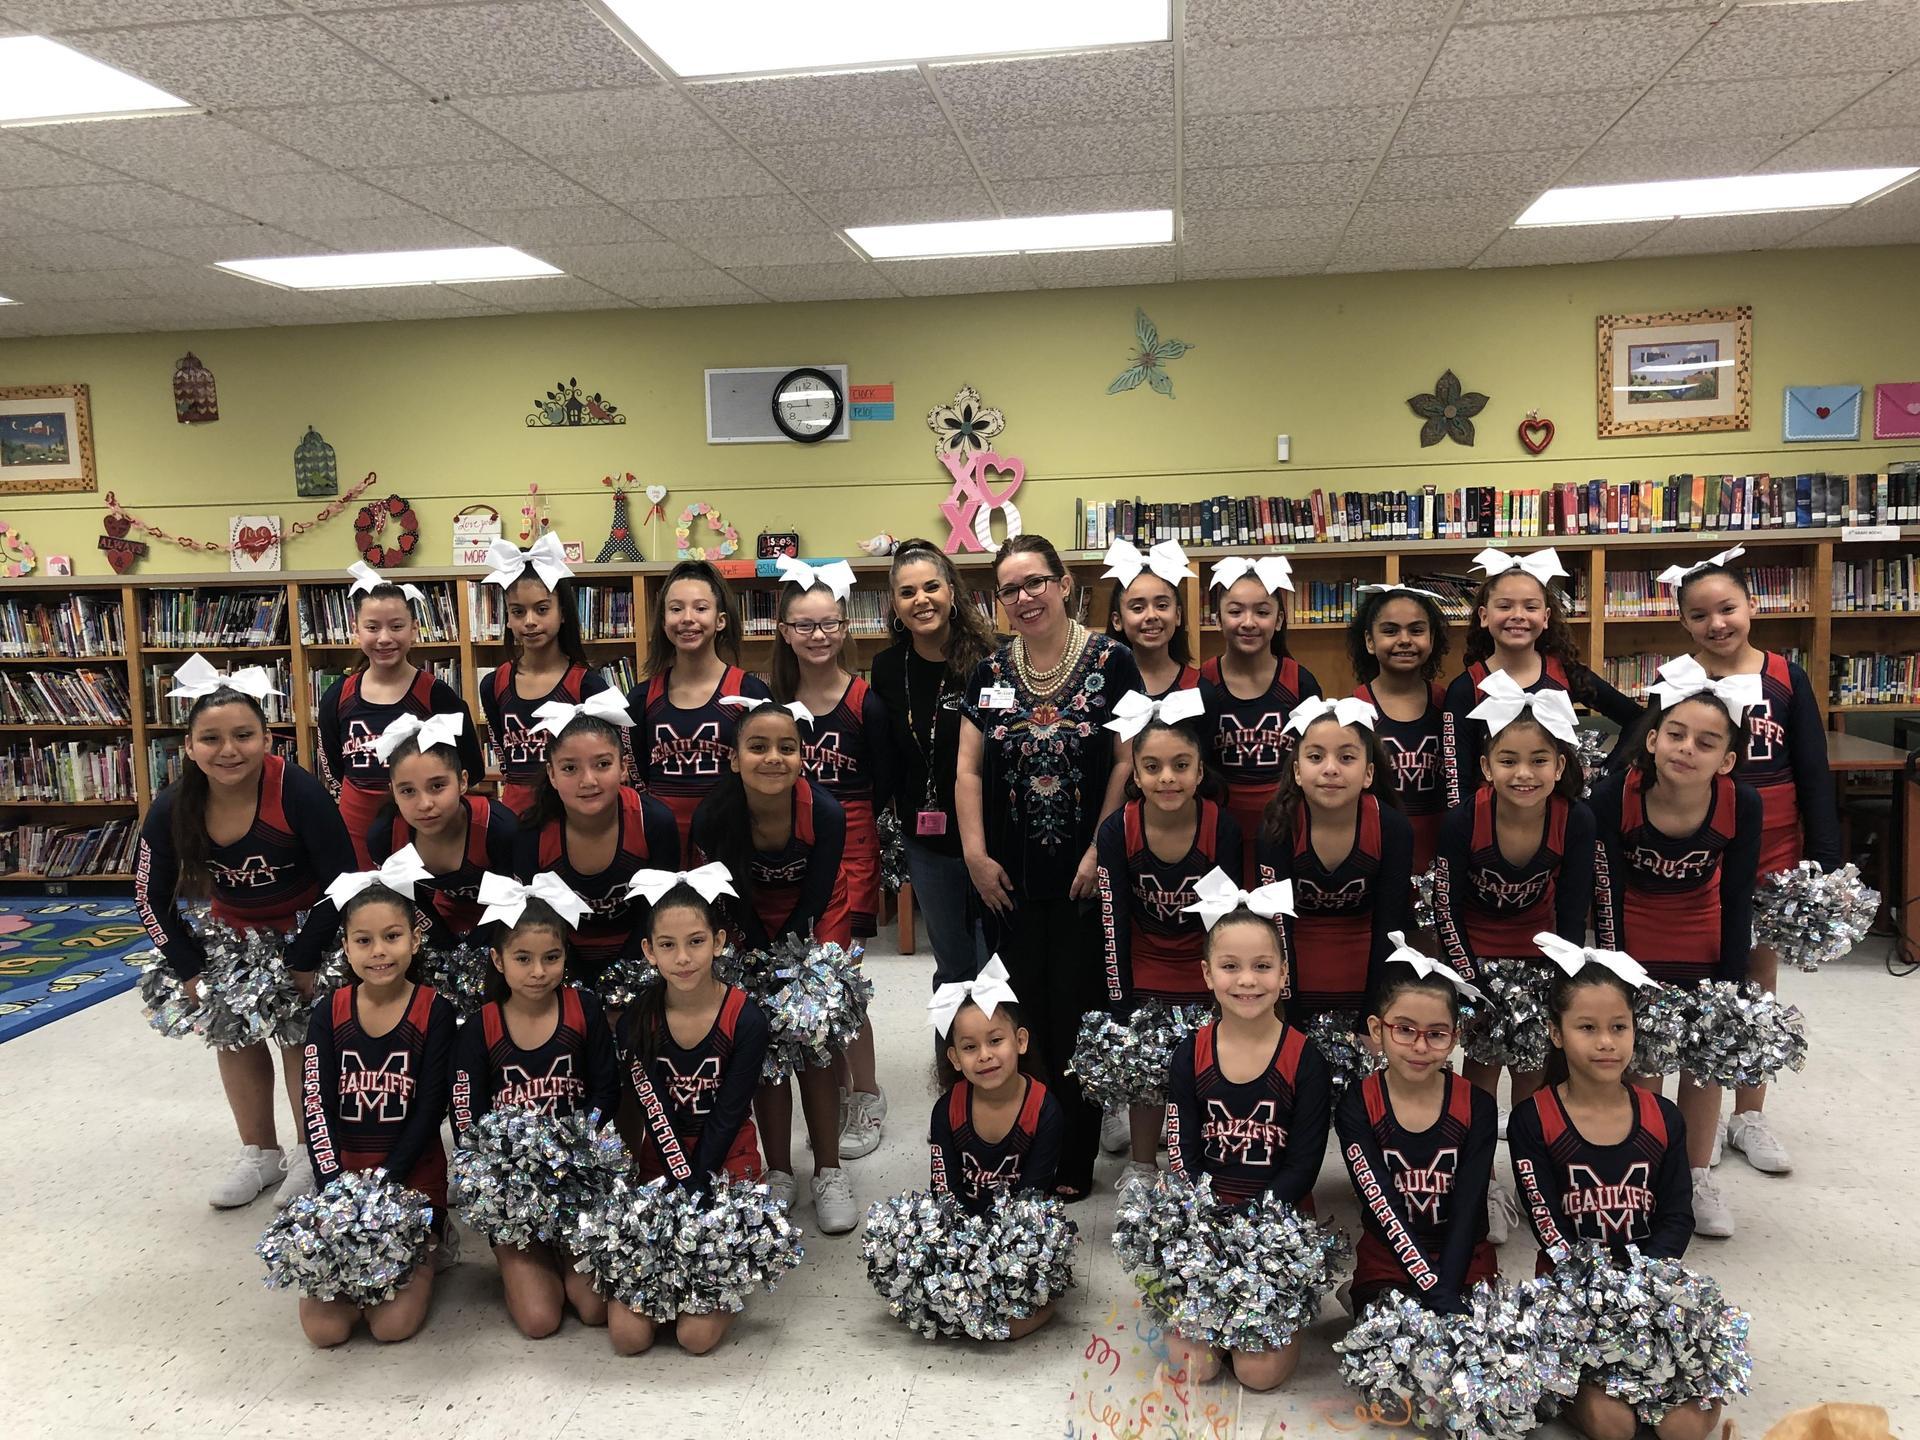 cheerleaders dancing